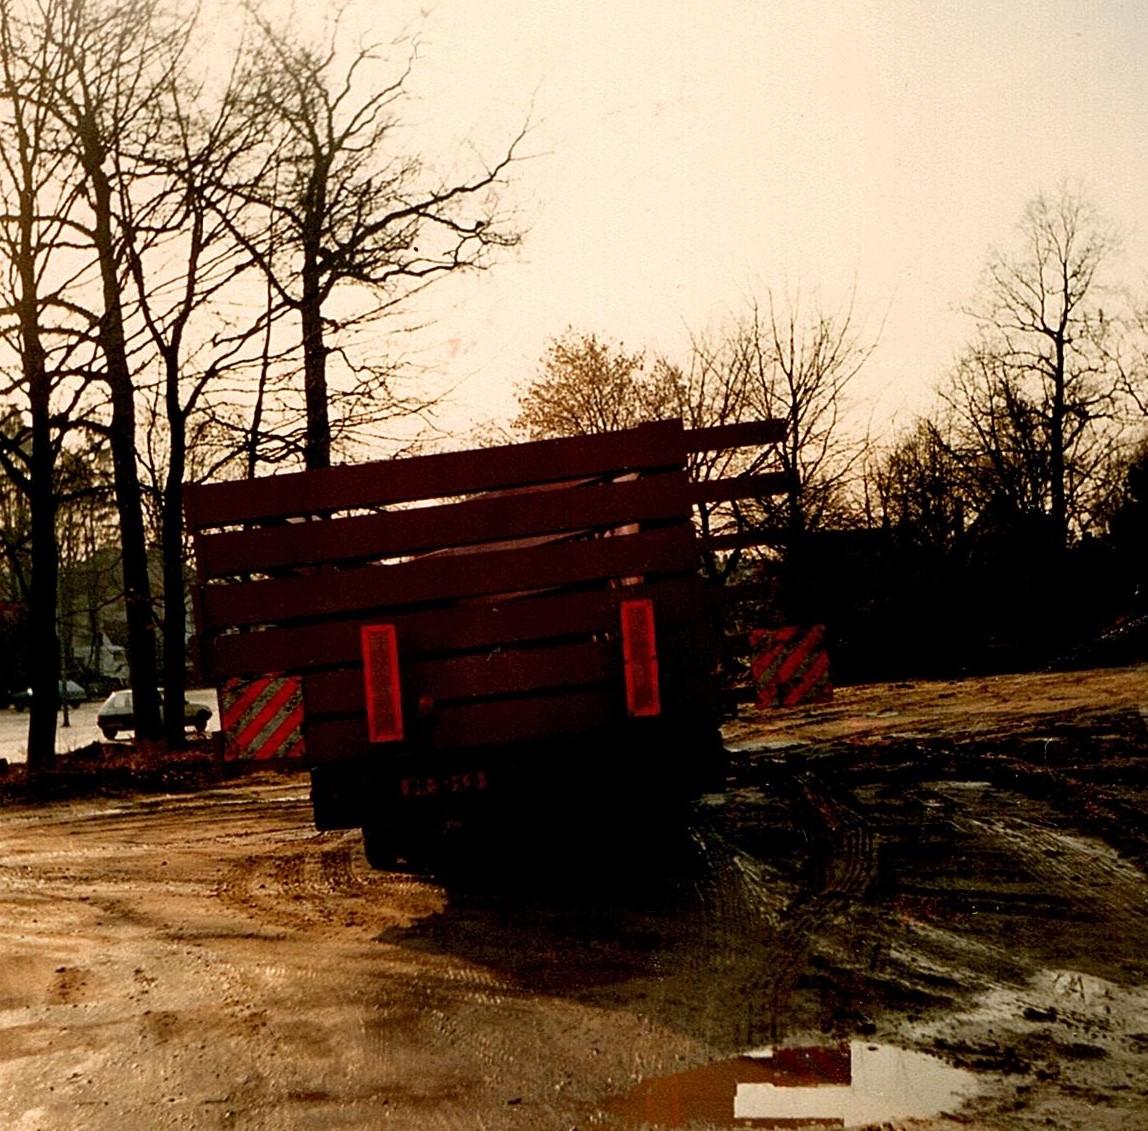 daf-breedte-transport-bert-cosemans-2